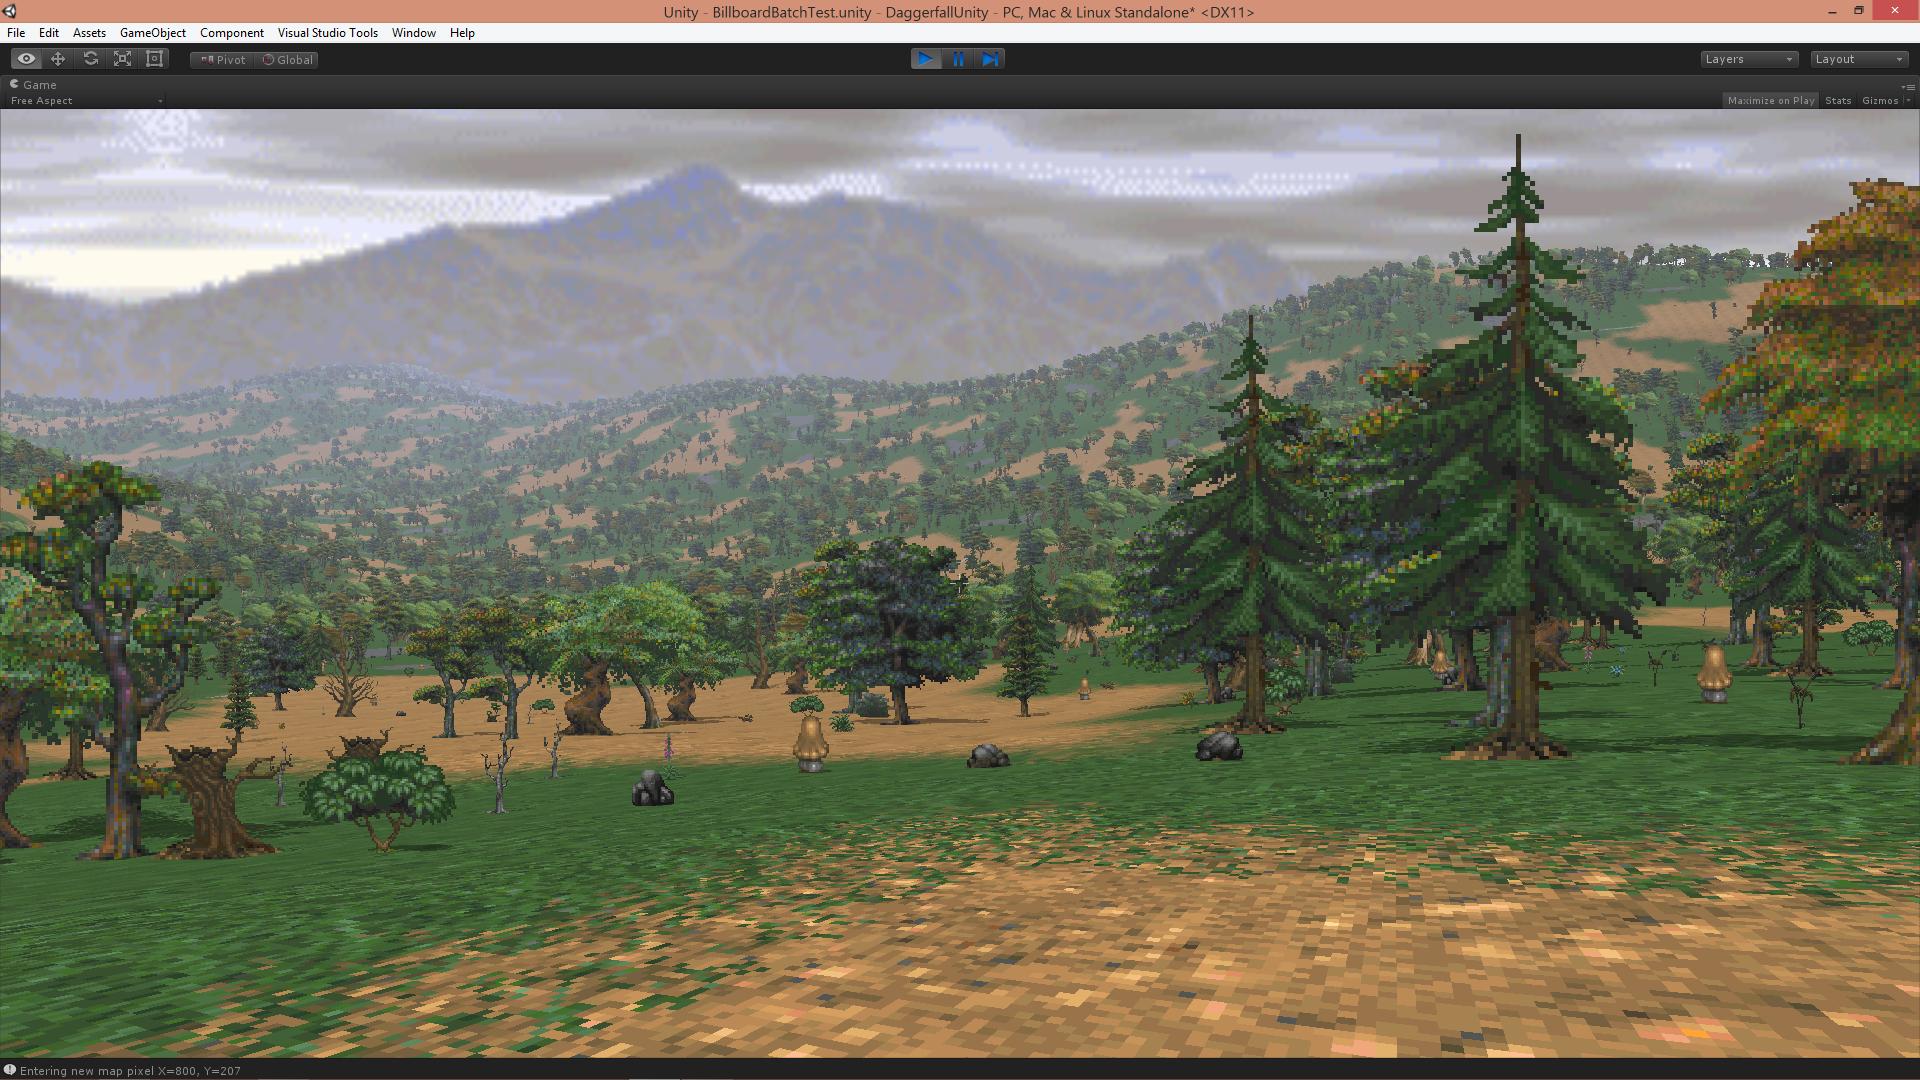 FIxed Tree Alignment image - Daggerfall Unity mod for Elder Scrolls